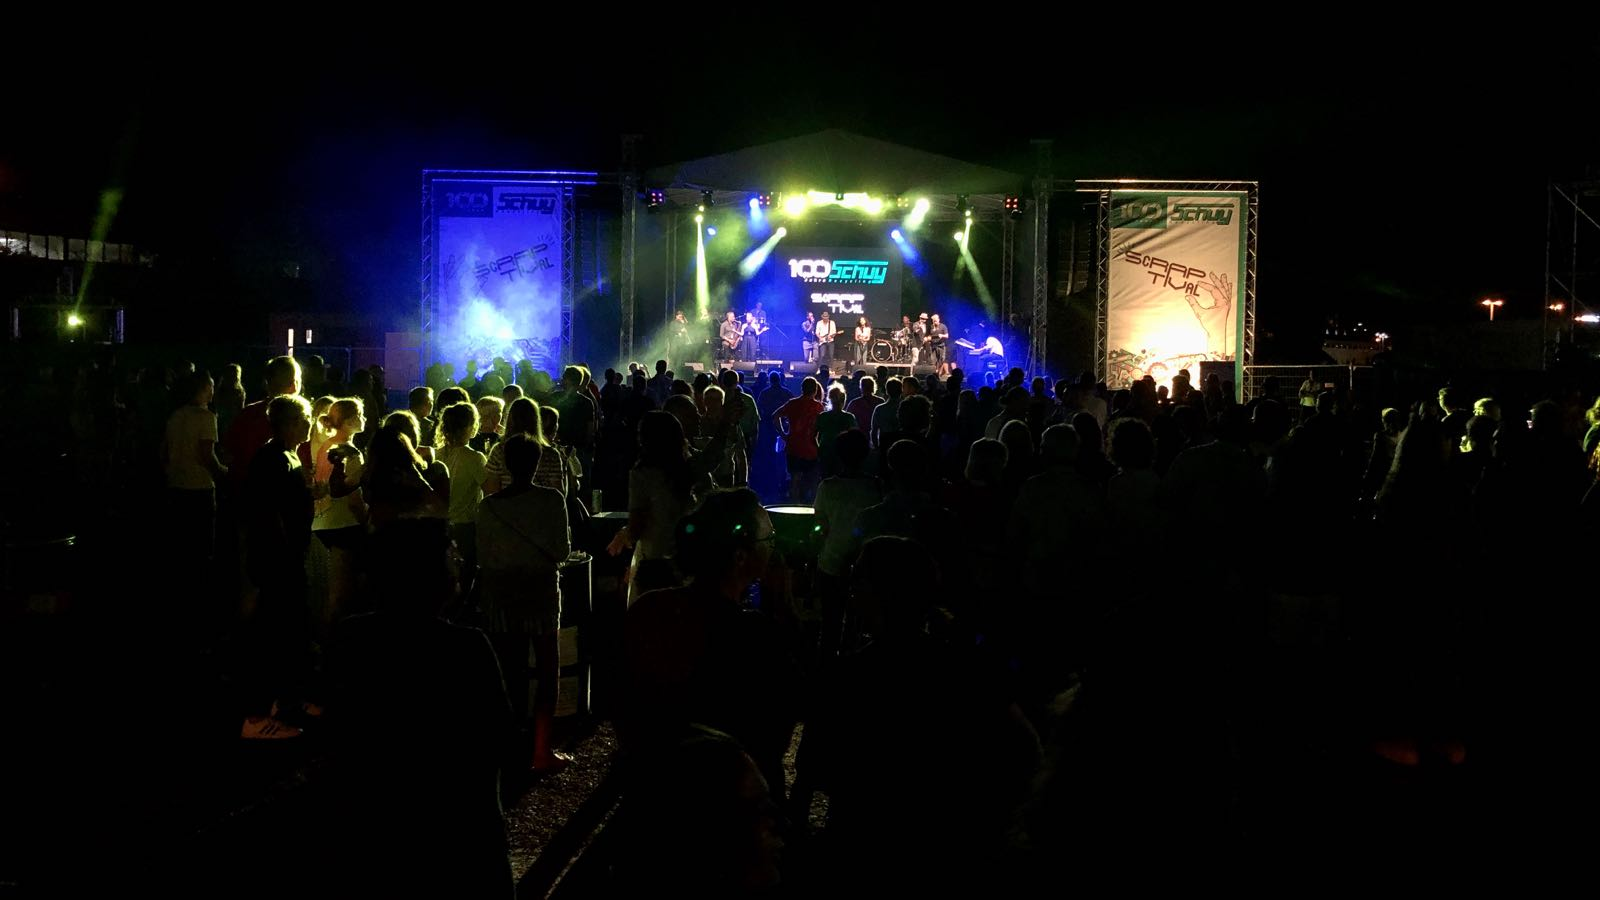 Scraptival - Das Festival zu 100 Jahre Schuy Recycling